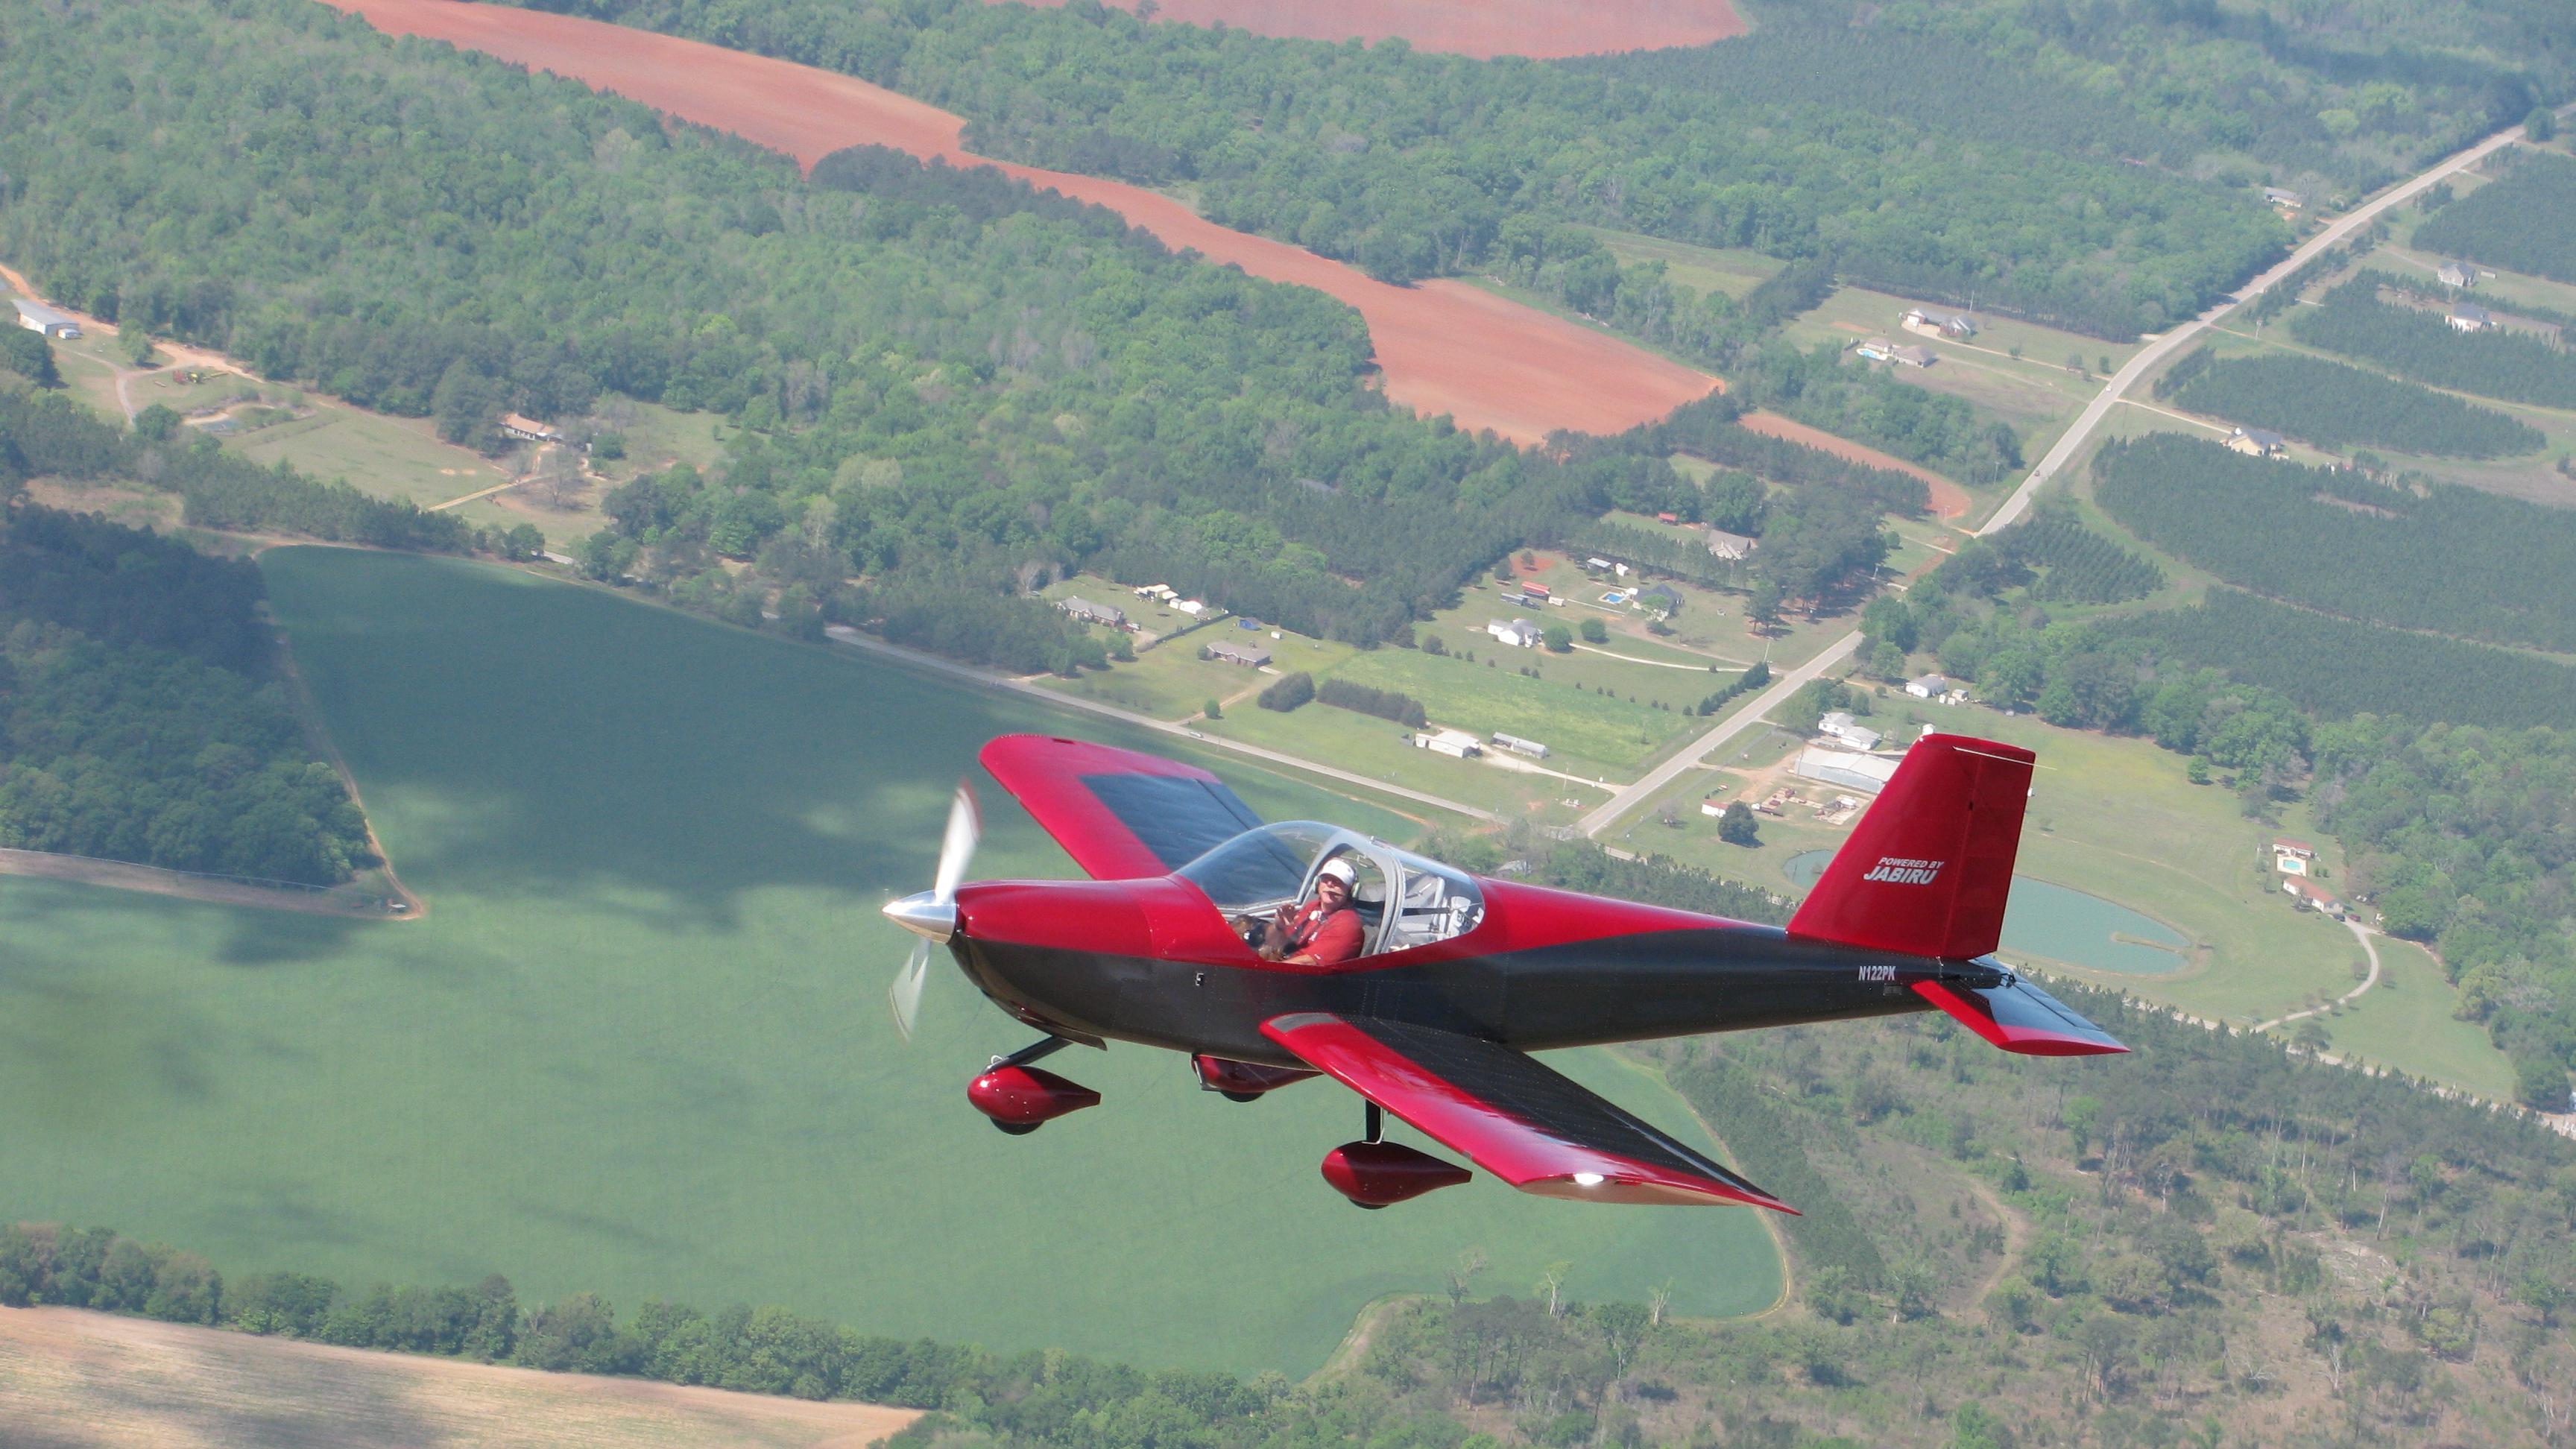 Photo: Pete's RV-12 flying to Sun 'n Fun 2012, where it won Grand Champion LSA.